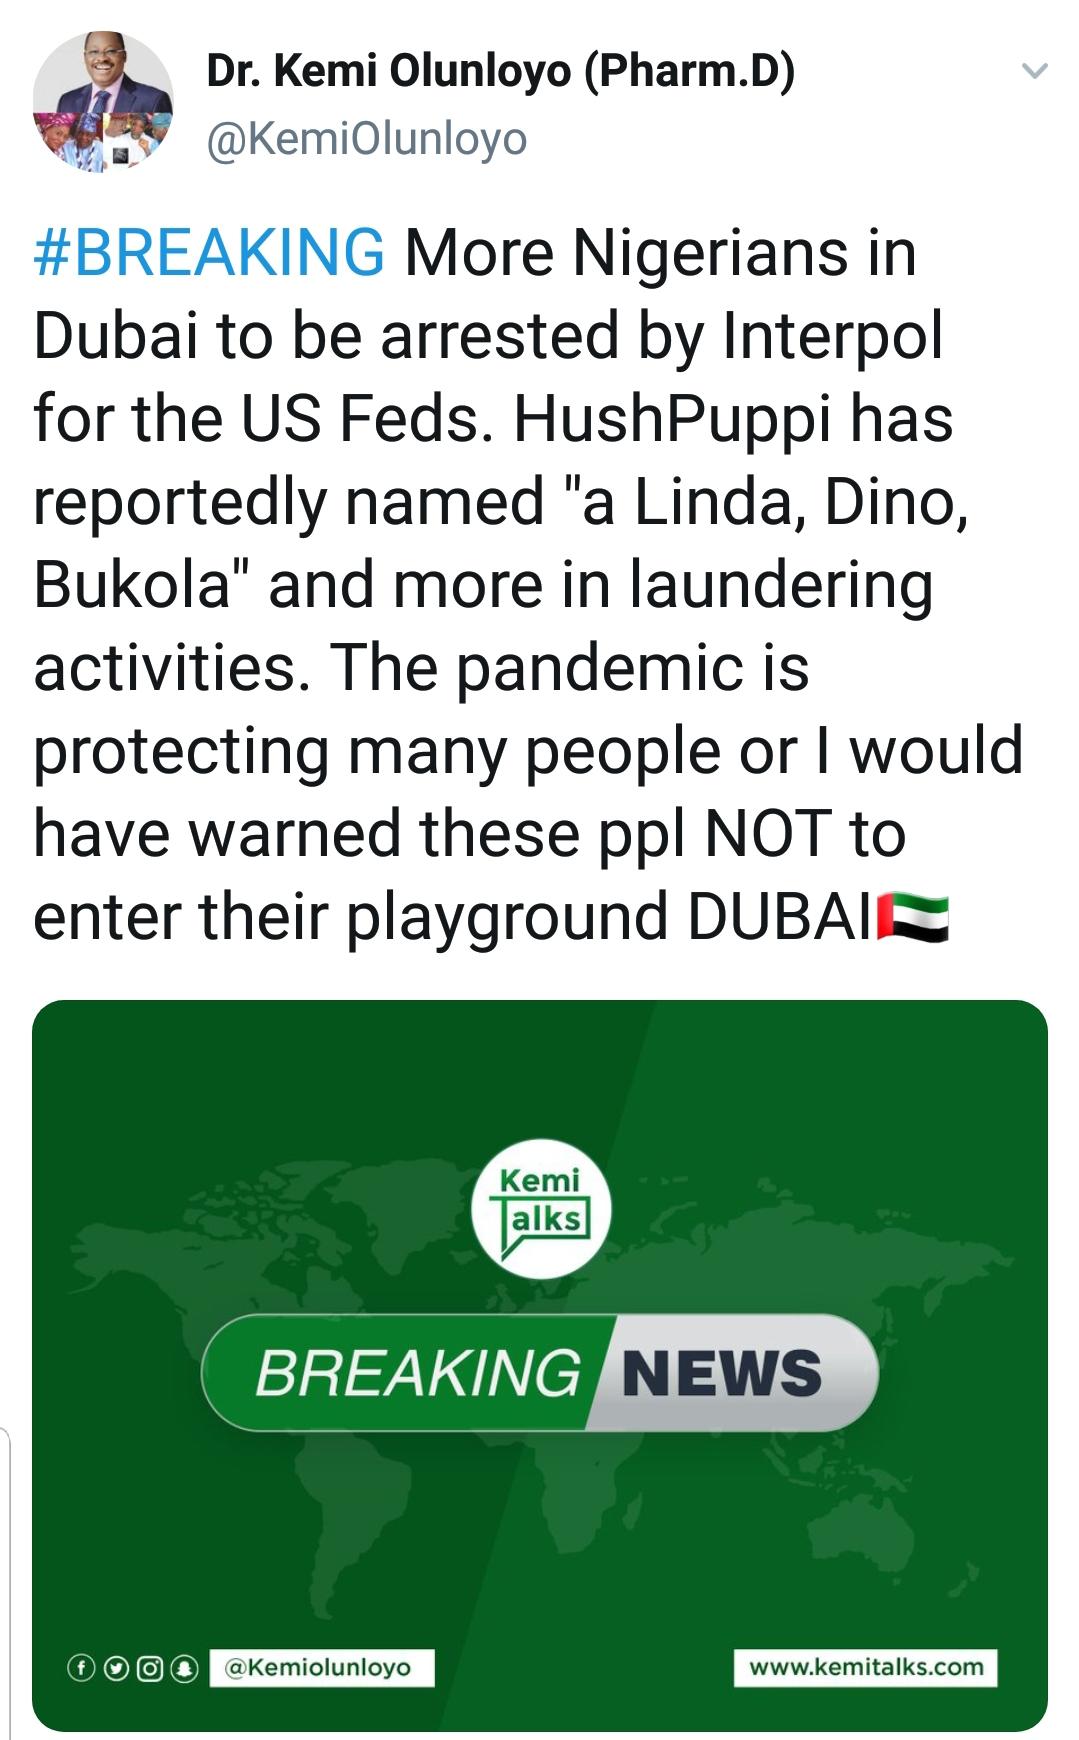 HushPuppi reportedly named Linda, Dino